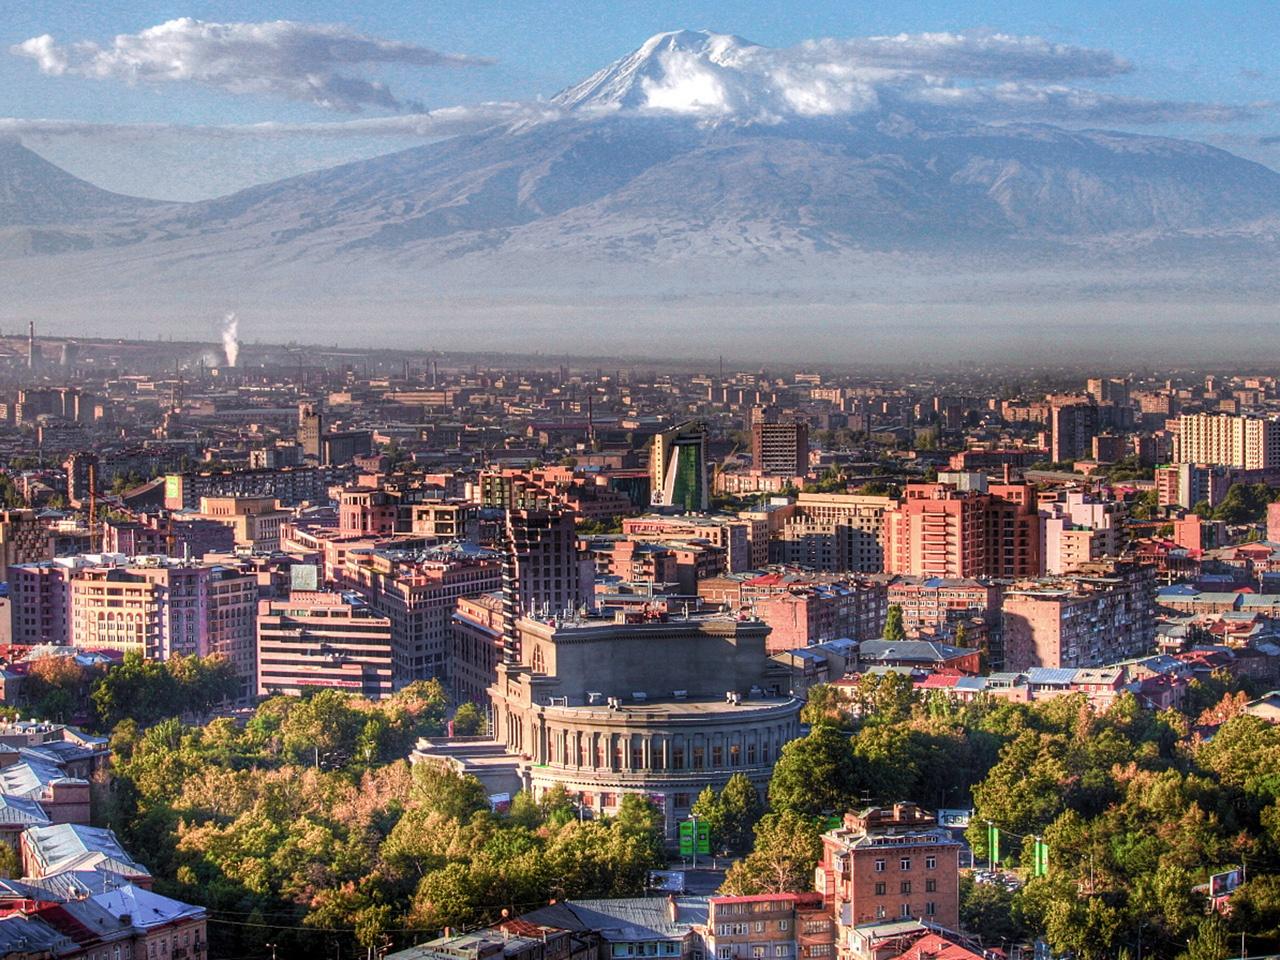 Yerevan_cityscape_in_Armenia_1280x960.jpg